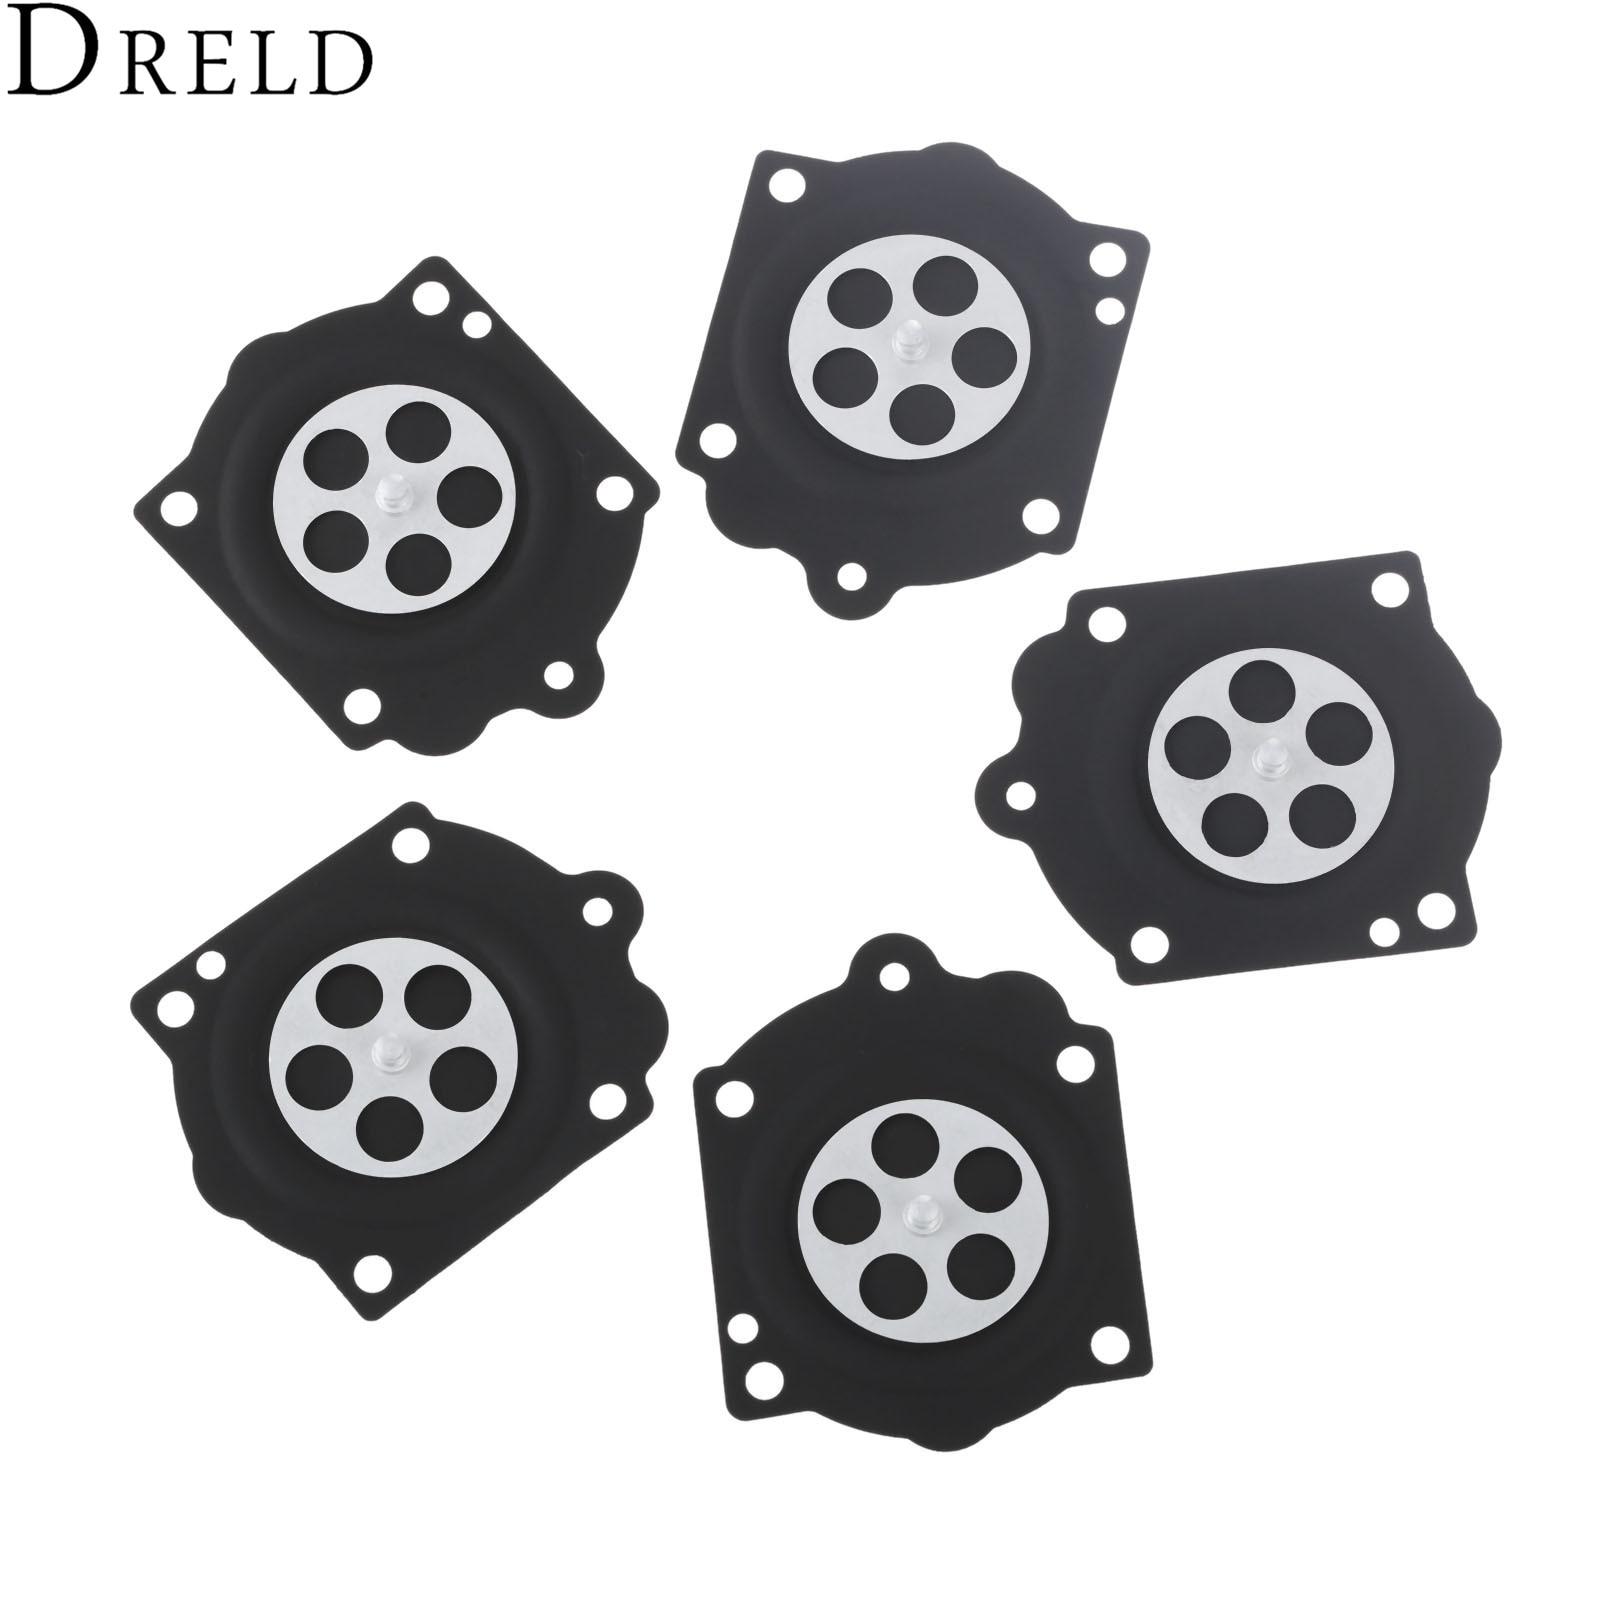 medium resolution of dreld 5pcs carburetor carb rebuild metering diaphragm kit for walbro hdb wg mcculloch pro mac 610 husq 272 ms660 chainsaw k15 wj